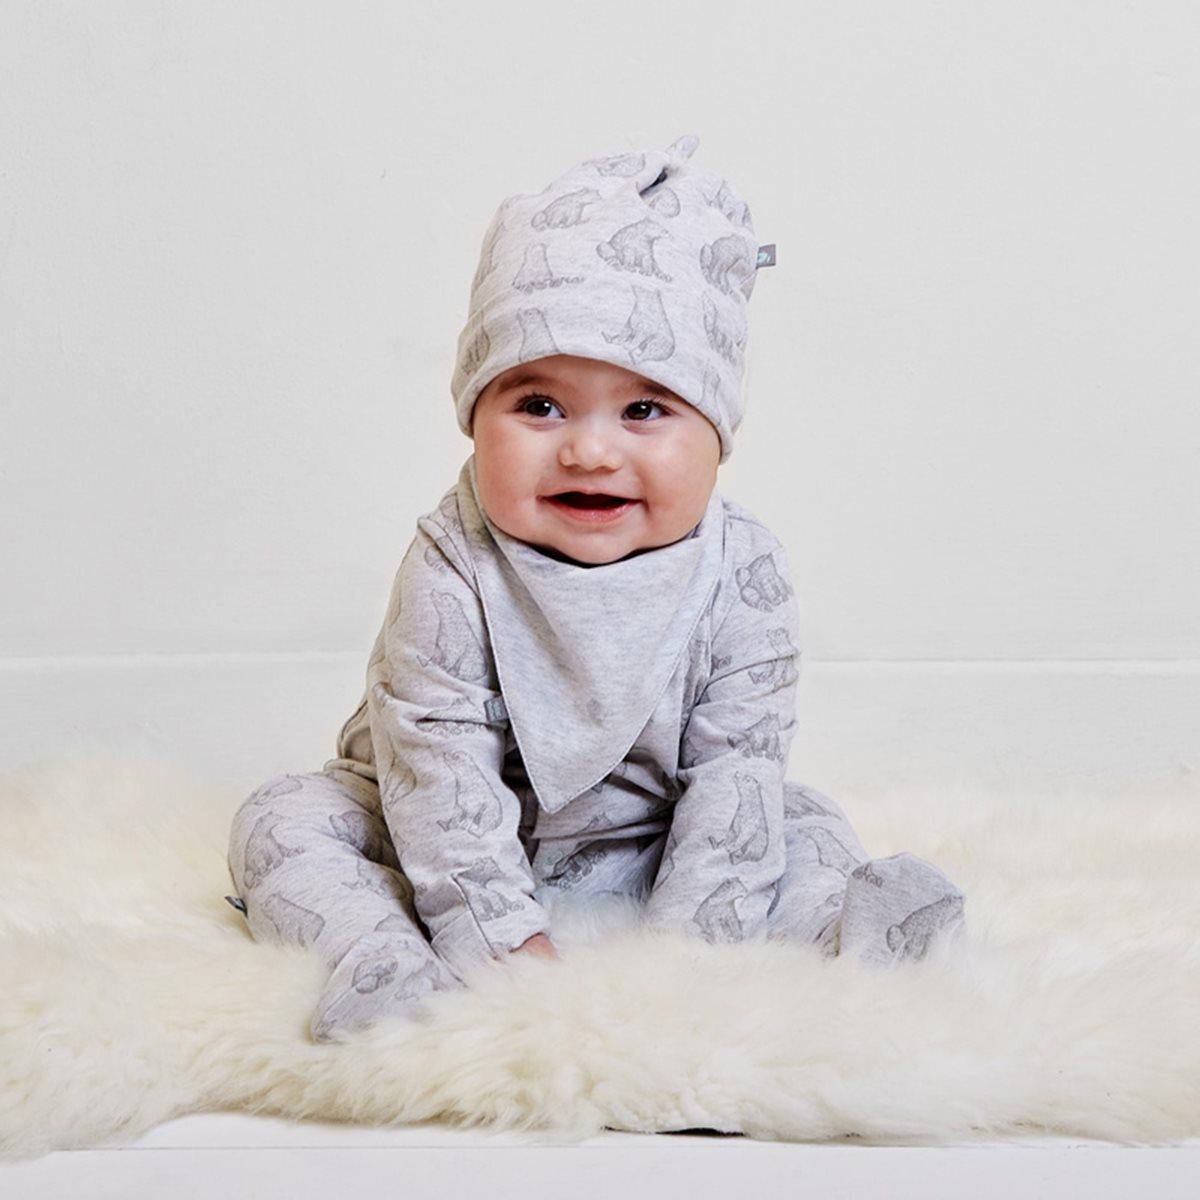 ... Wild Cotton Organic Baby Gift Set - Bear ... 4cc3d1f32eb4